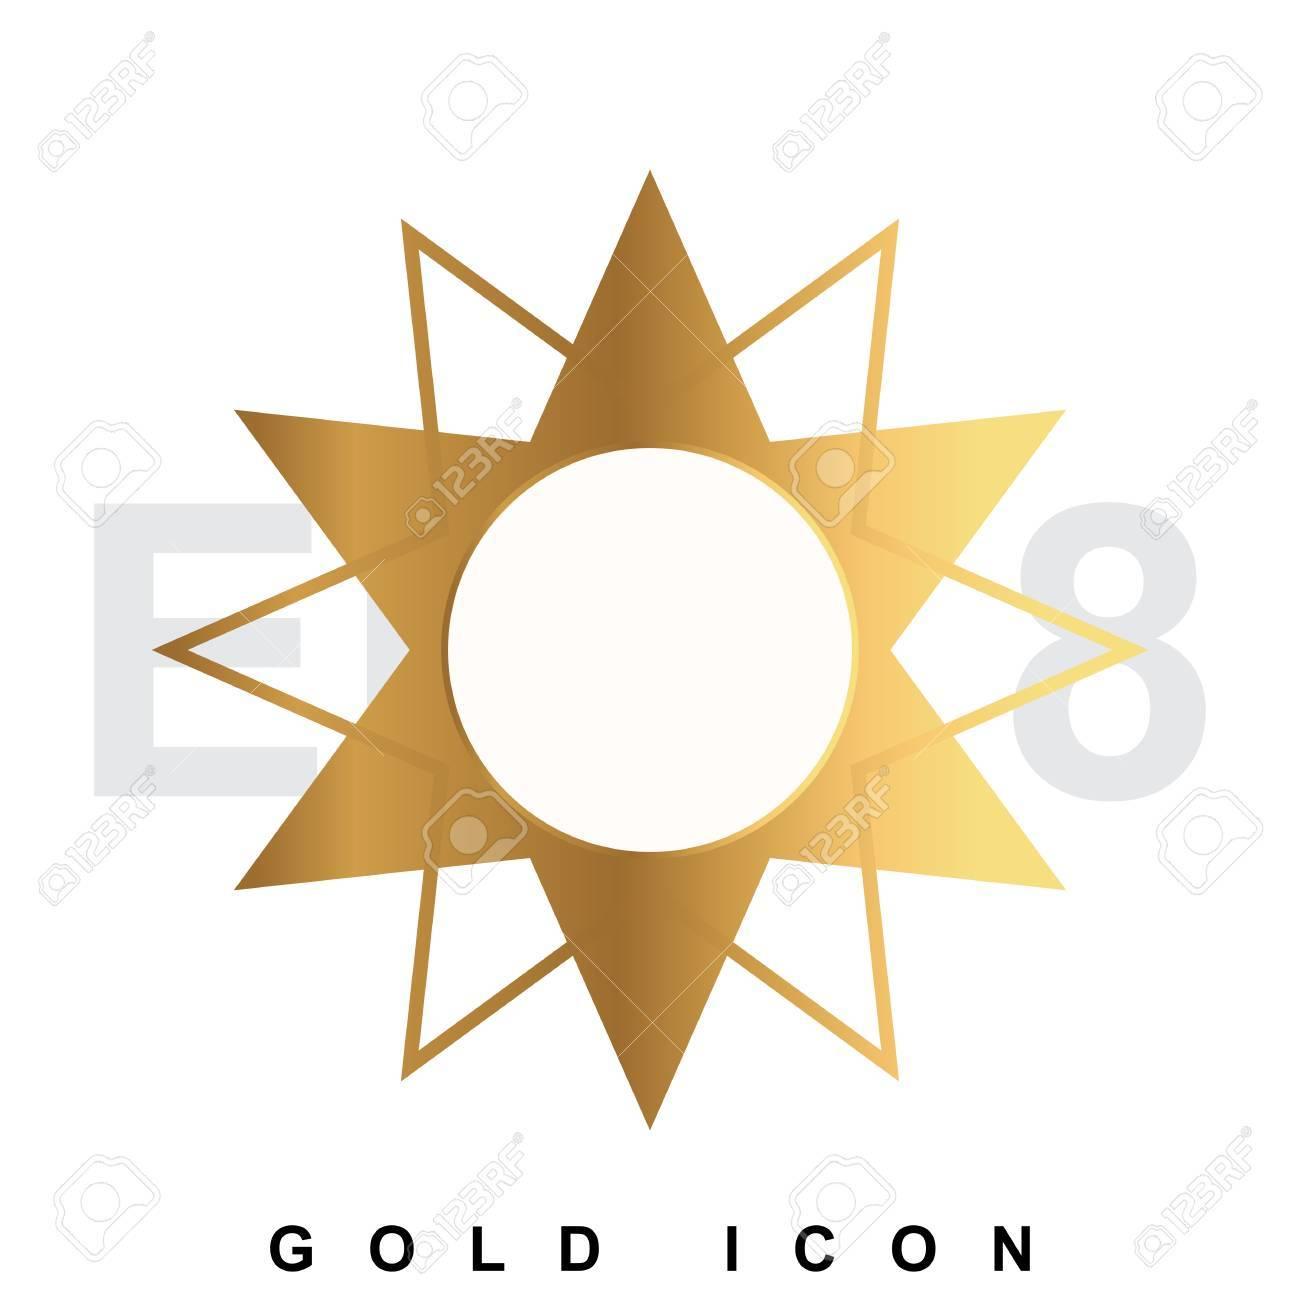 golden sun premium icon graphic web design element template rh 123rf com Free Vector Backgrounds free vector gold border